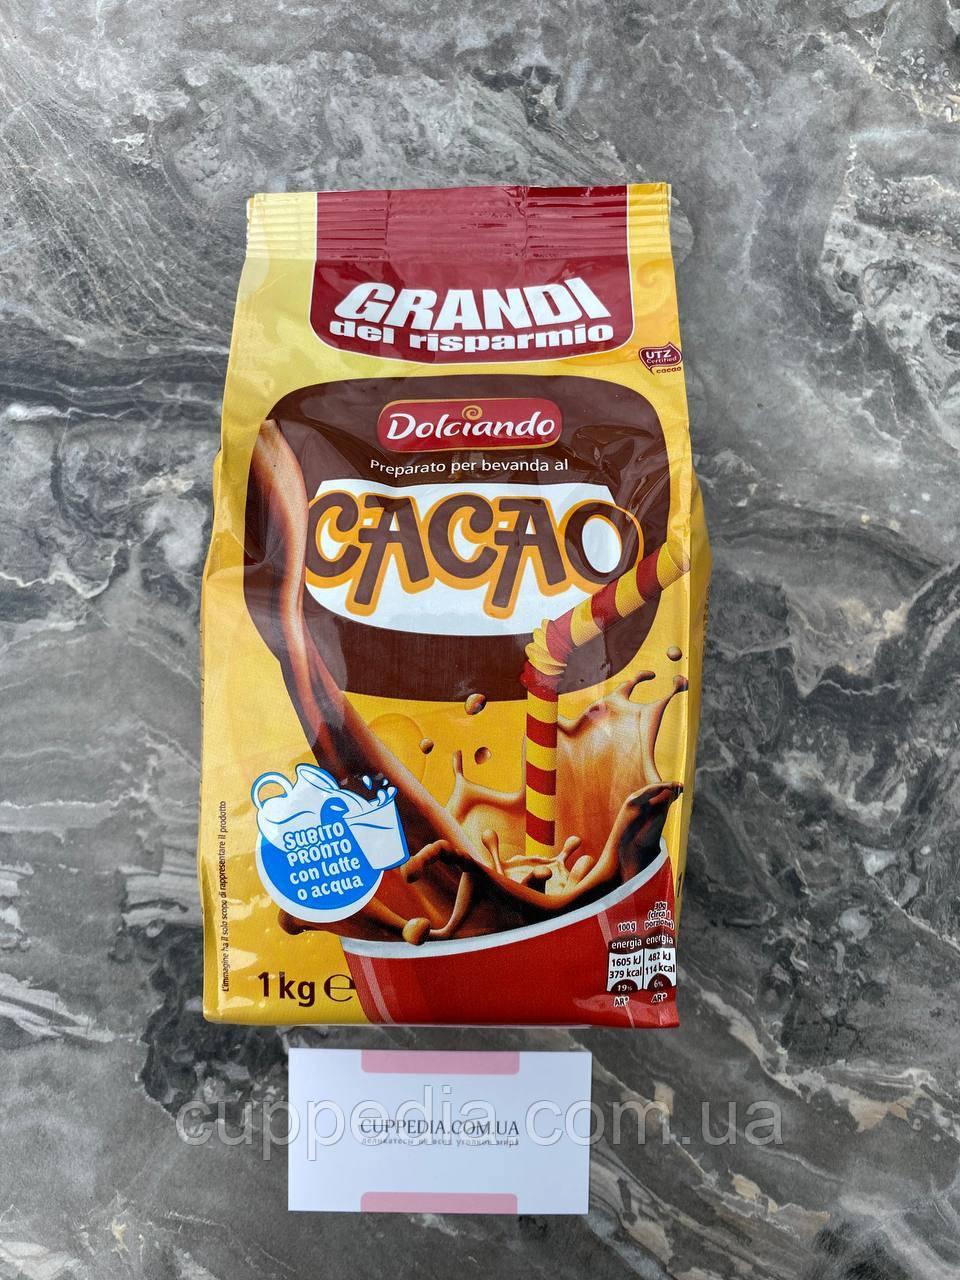 Cacao Dolciando 1 кг